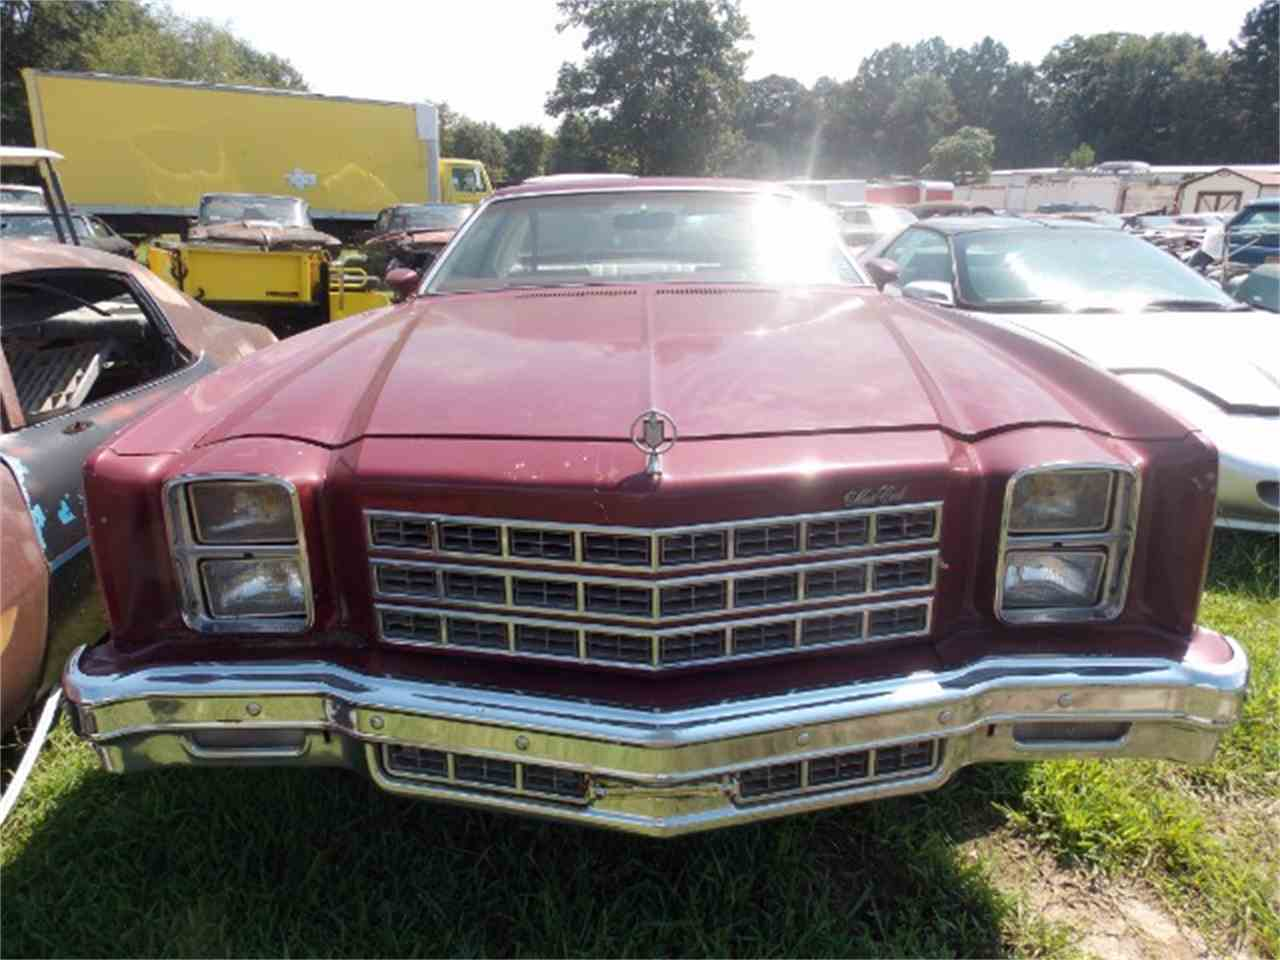 1978 Chevrolet Monte Carlo for Sale | ClassicCars.com | CC-1013022